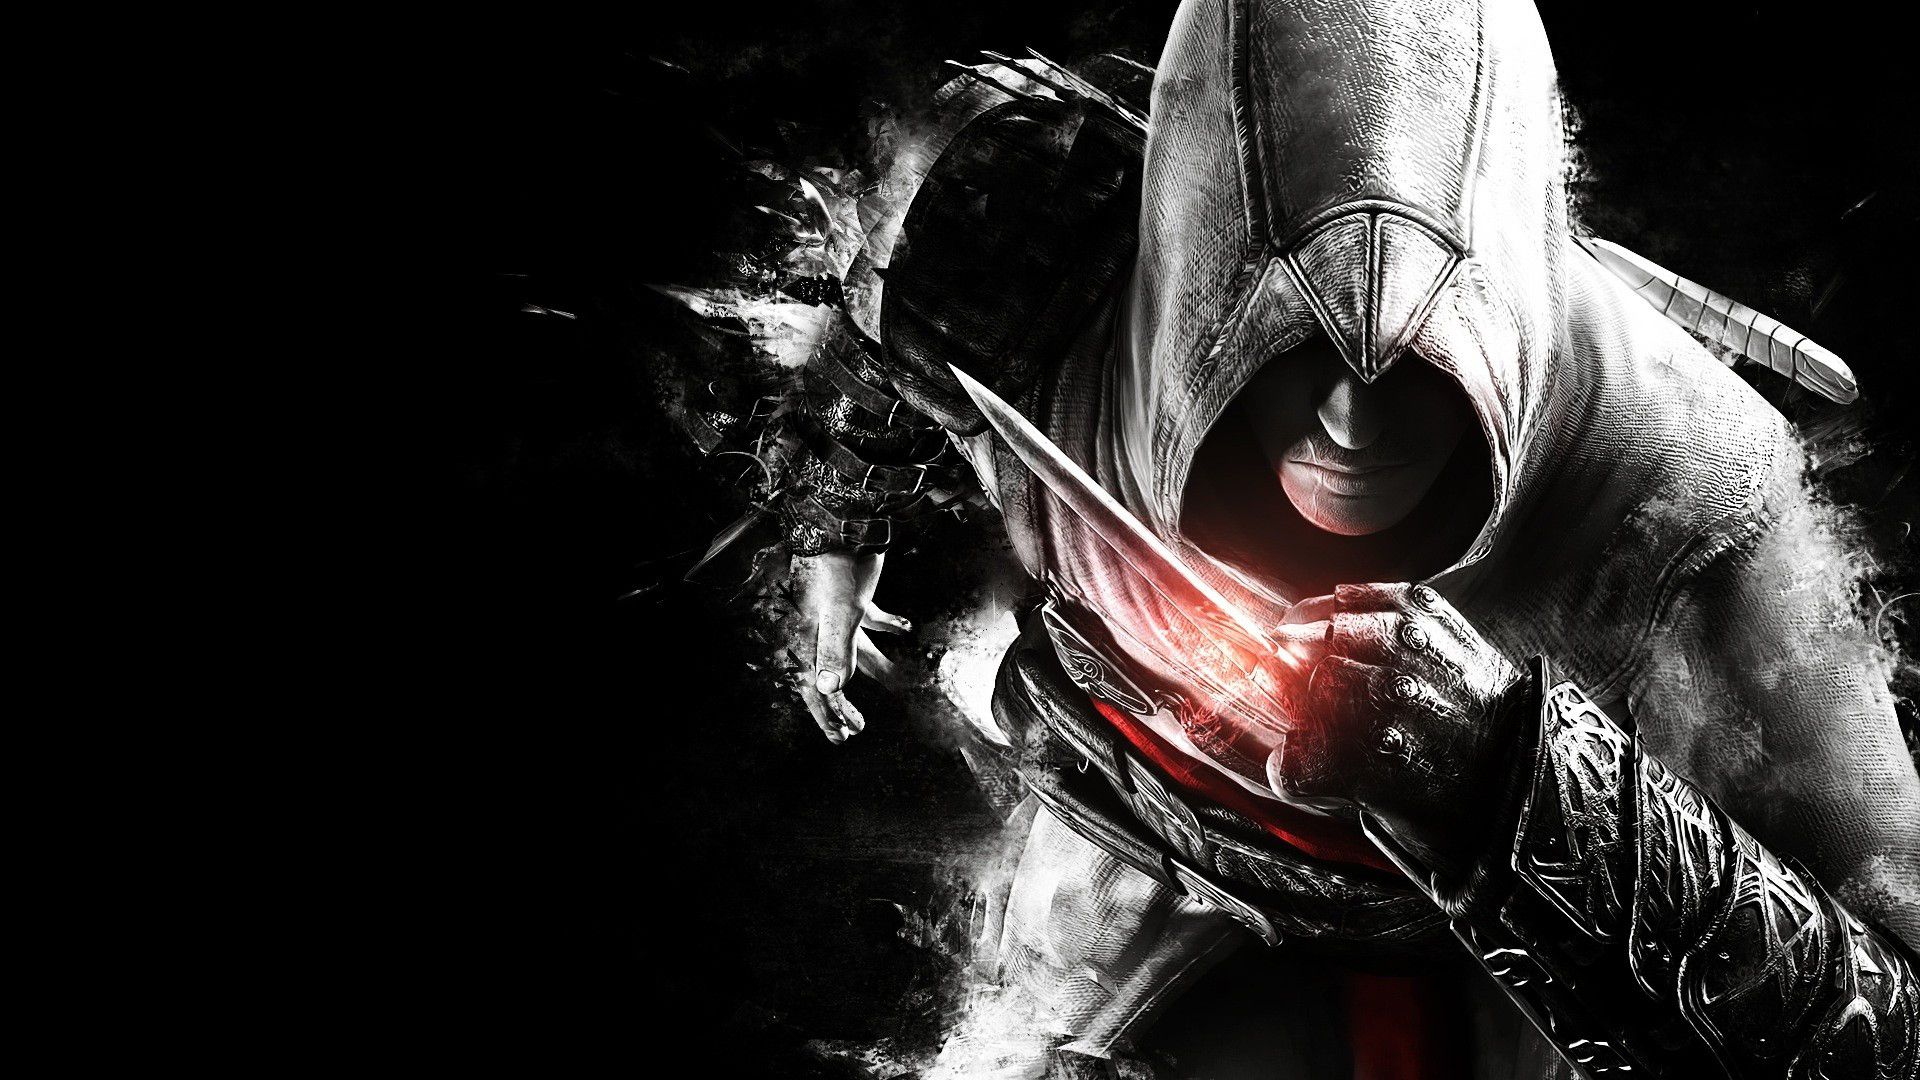 Pin by Ovidiu Drobotă on WallPapers   Assassin's creed wallpaper, Assassins creed anime ...